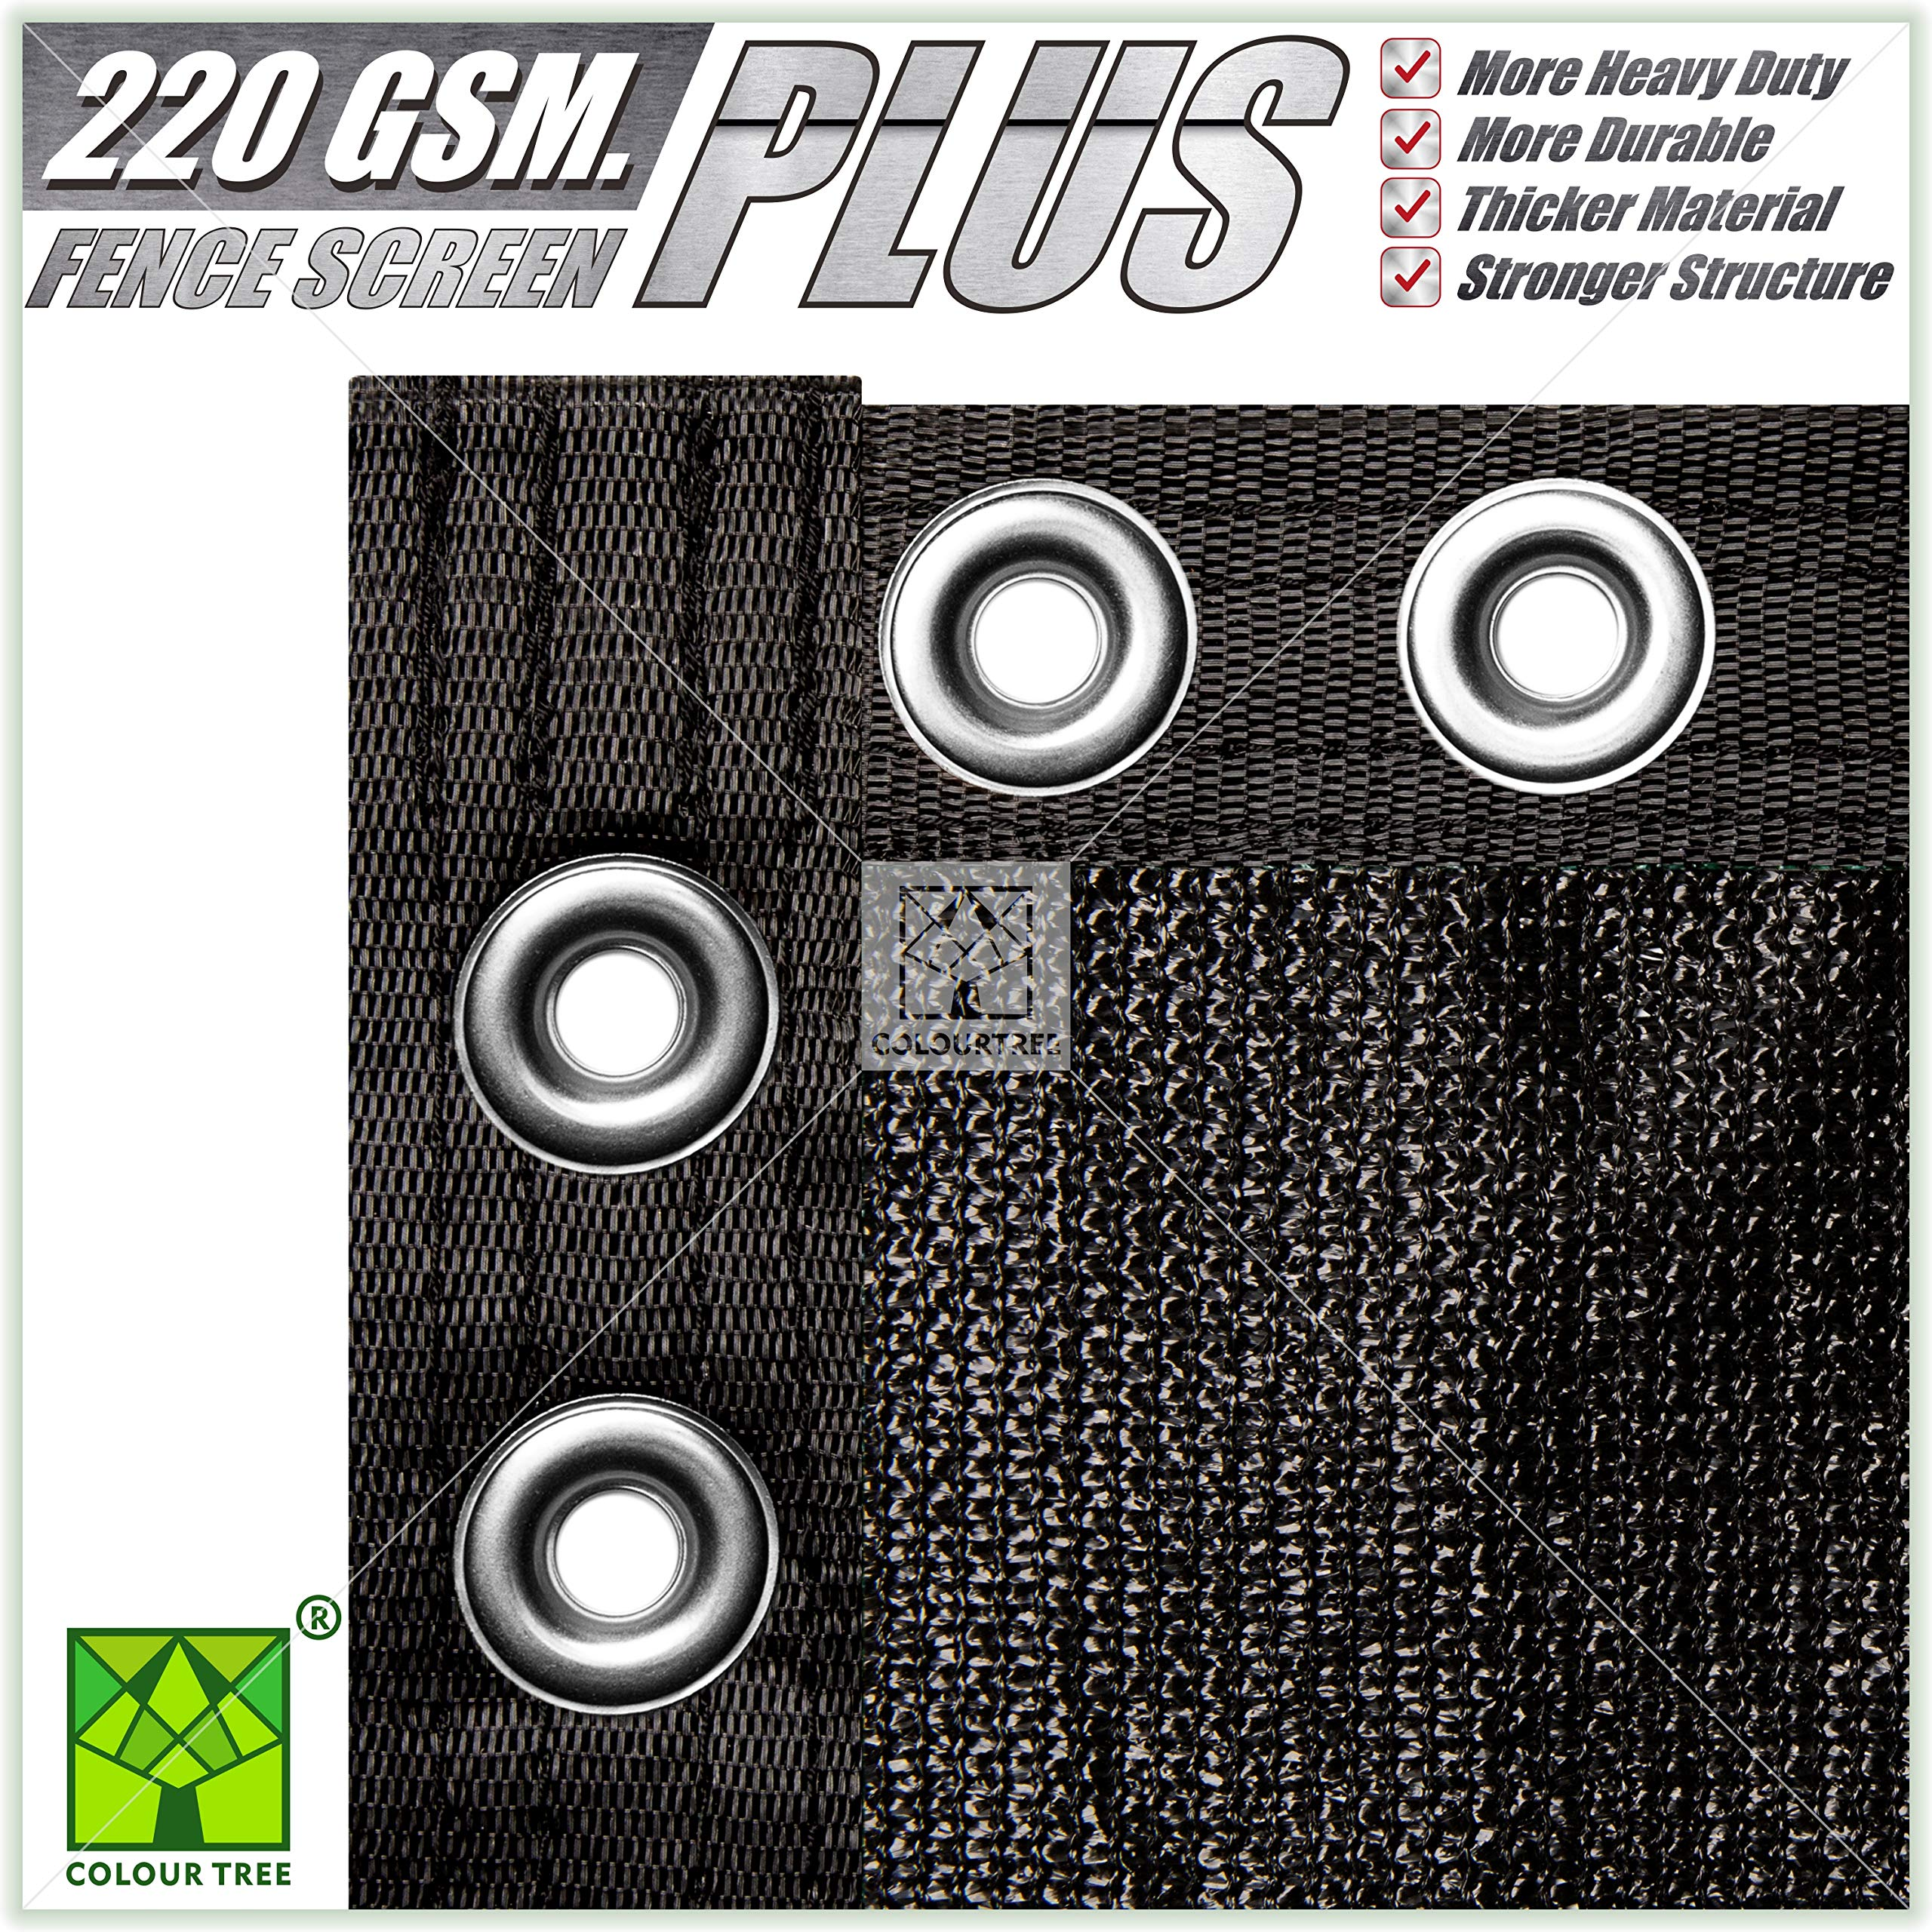 ColourTree Plus Extra Heavy Duty Fence Screen Privacy Screen - Commercial Grade 220 GSM - Heavy Duty - 3 Years Warranty (4' x 50', Black Plus)